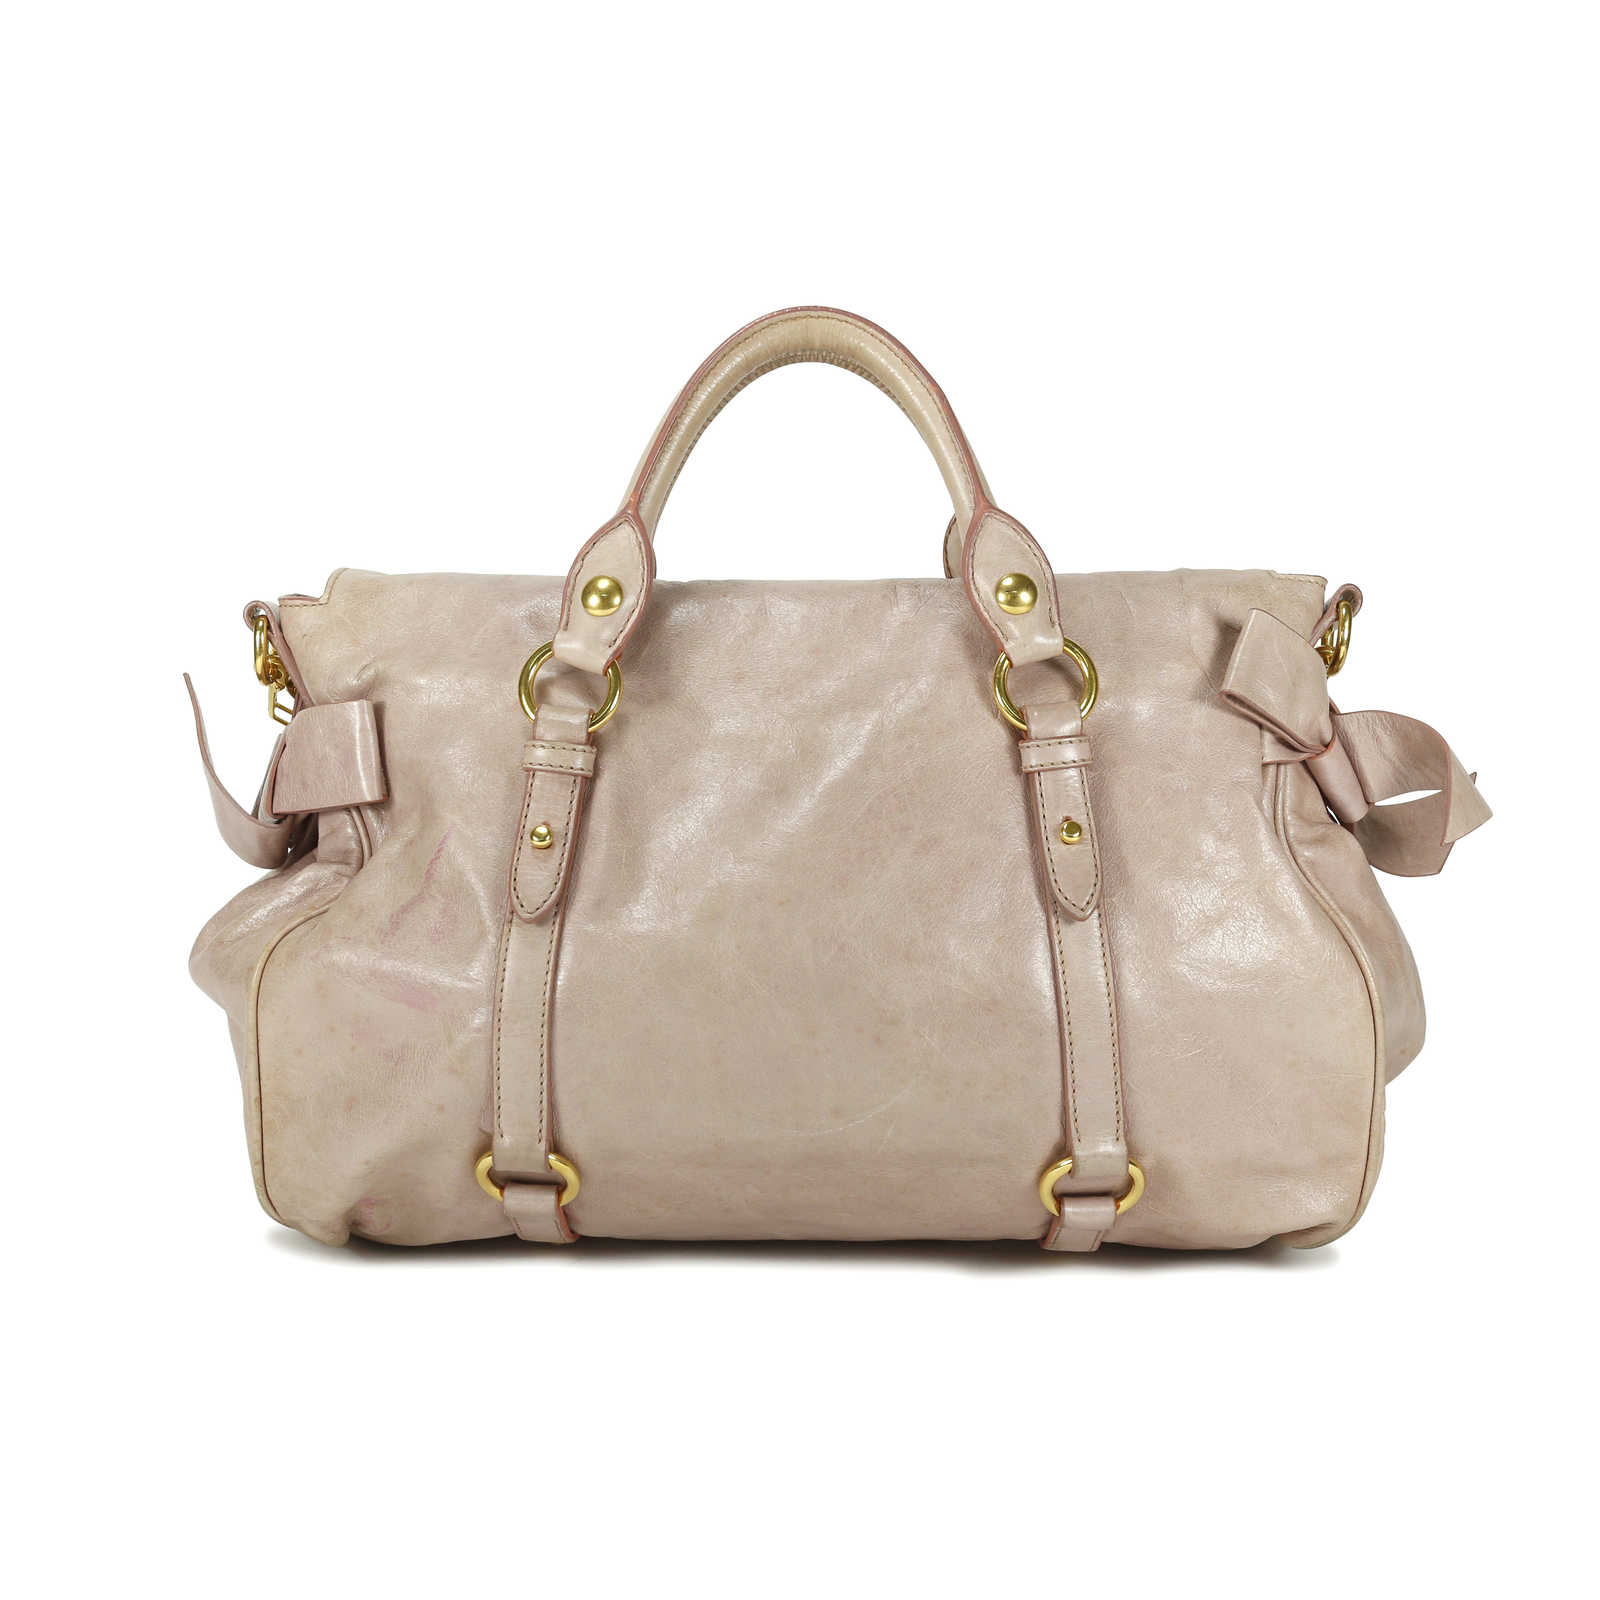 Authentic pre owned miu vitello lux bow bag pss jpg 1600x1600 Lux bow miu  vitello bags 470a73fc34